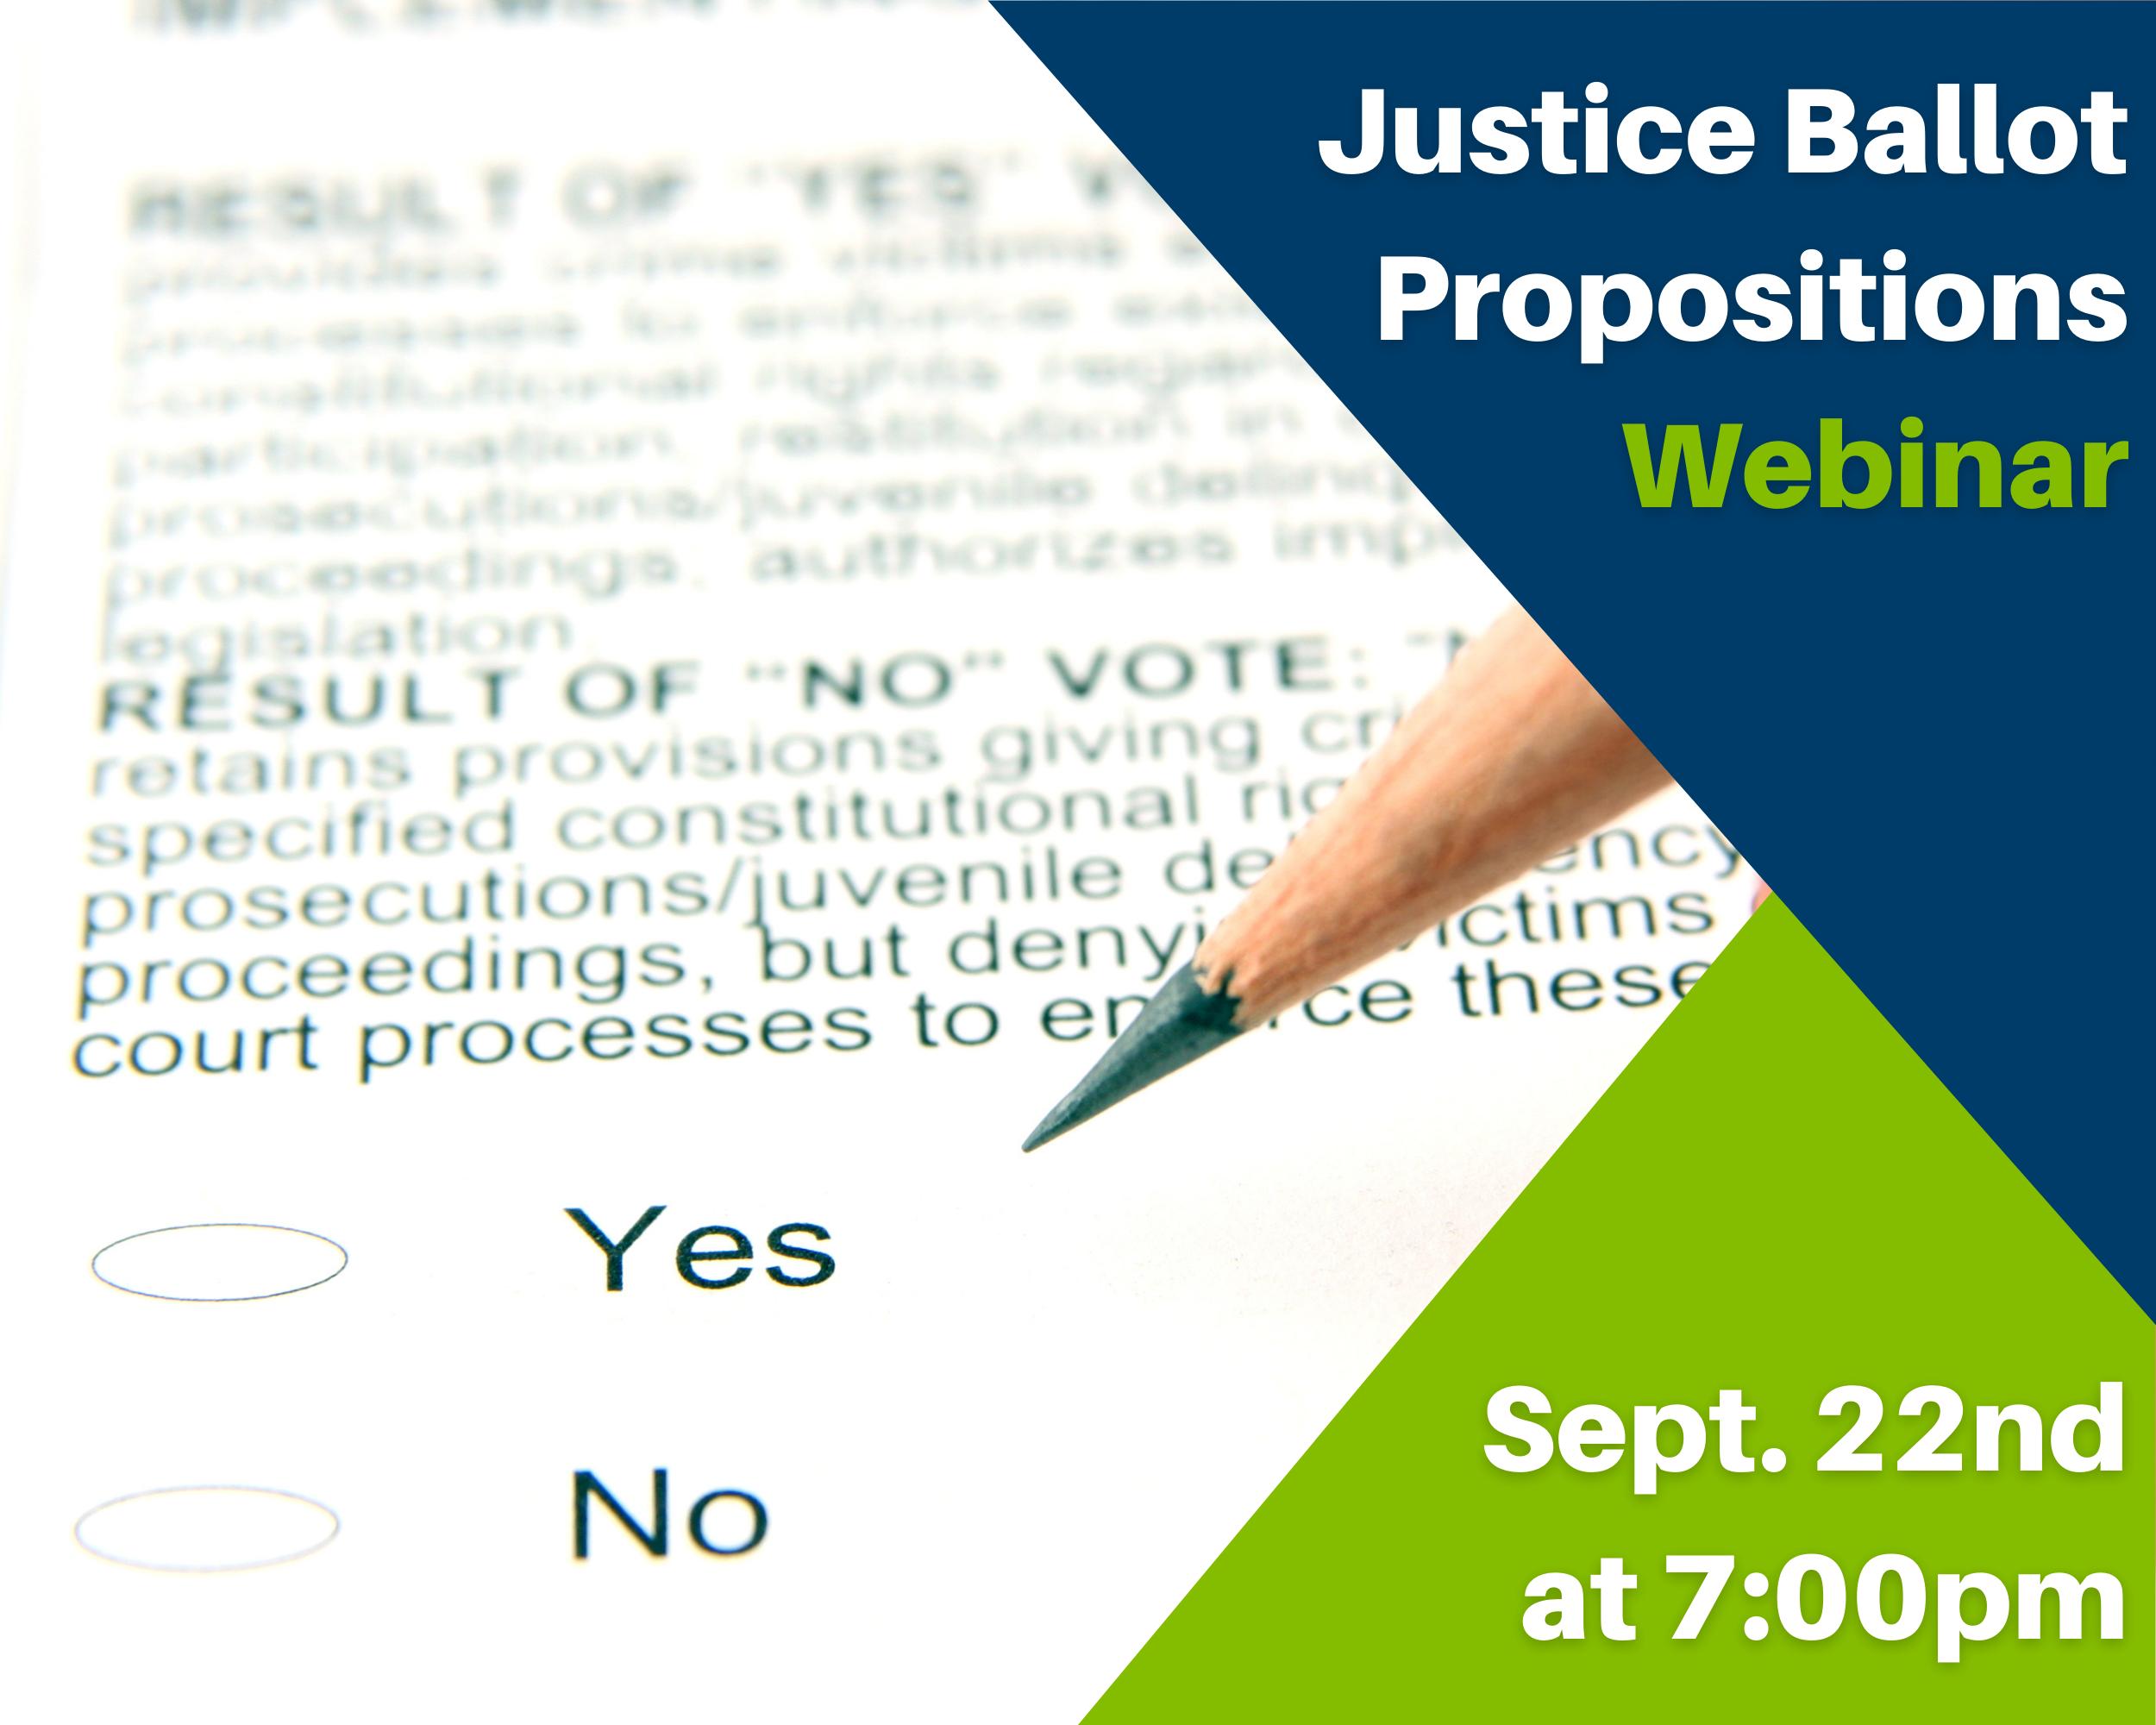 California Justice Ballot Propositions 2020 Webinar